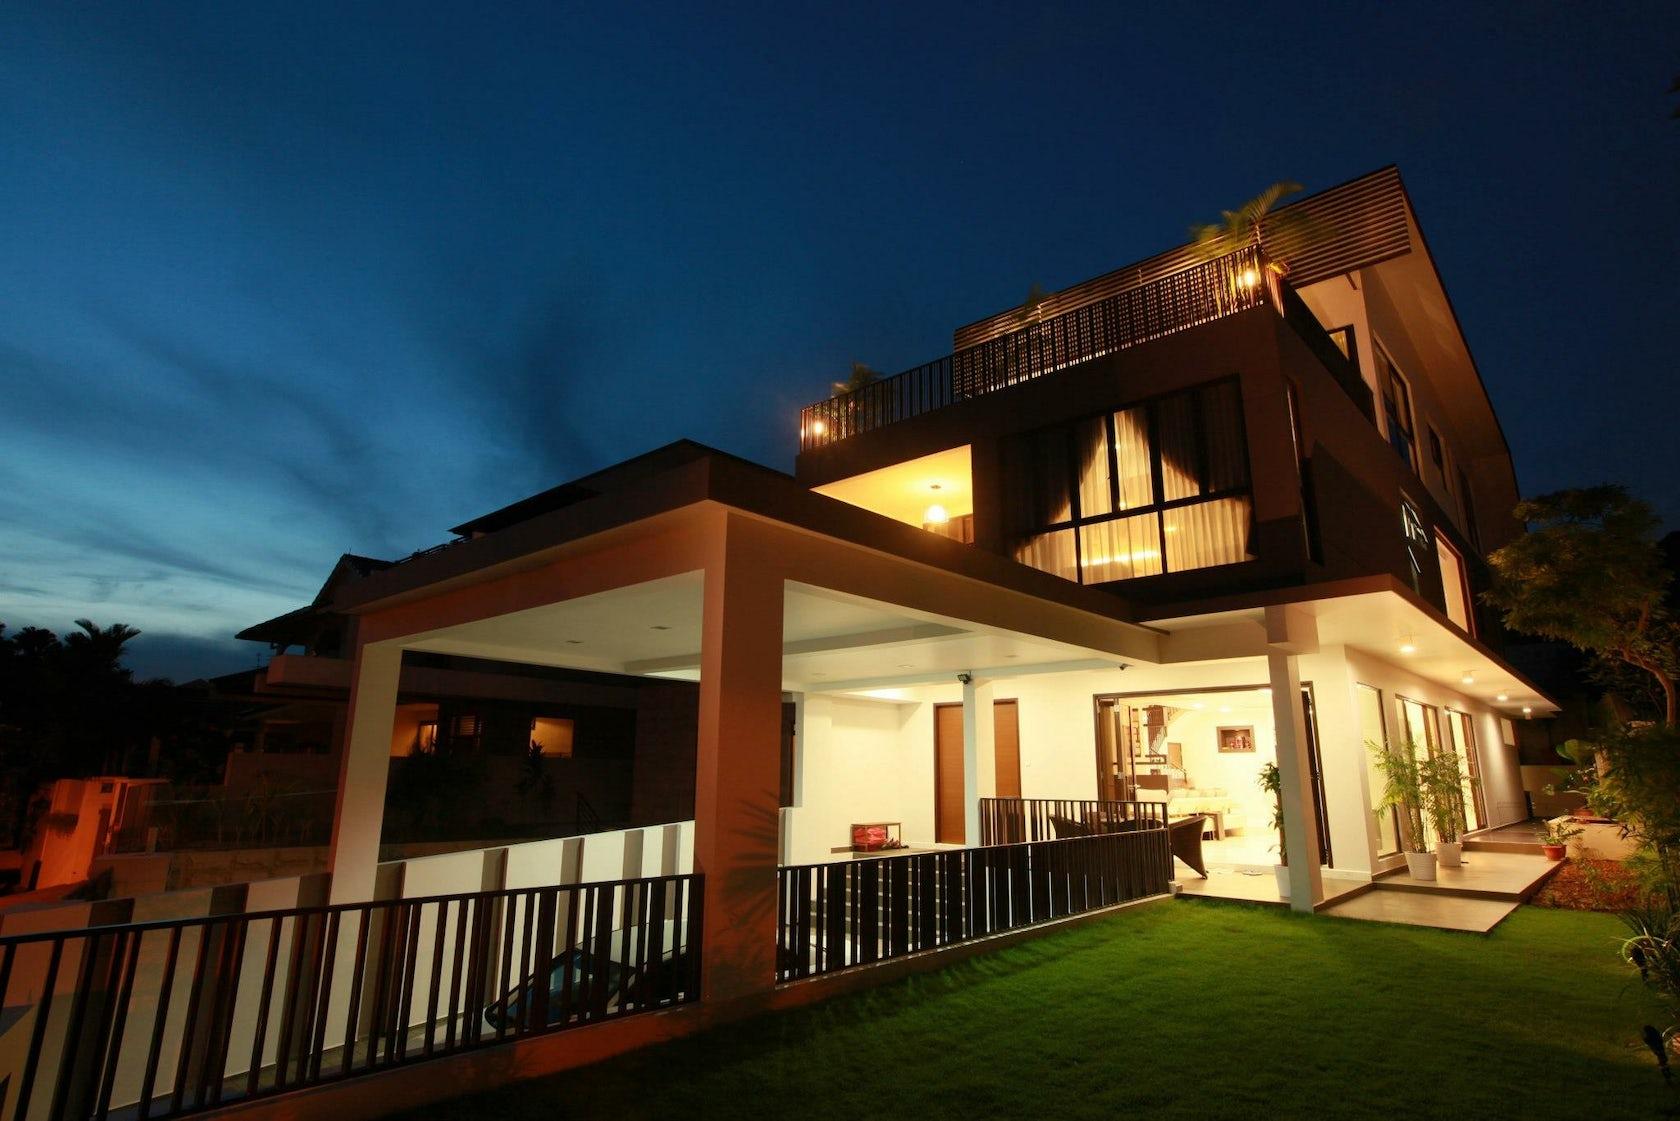 Newest Tropical Modern Minimalist House Pictures 2020: Modern Tropical Minimalist House @ Seletar Estate